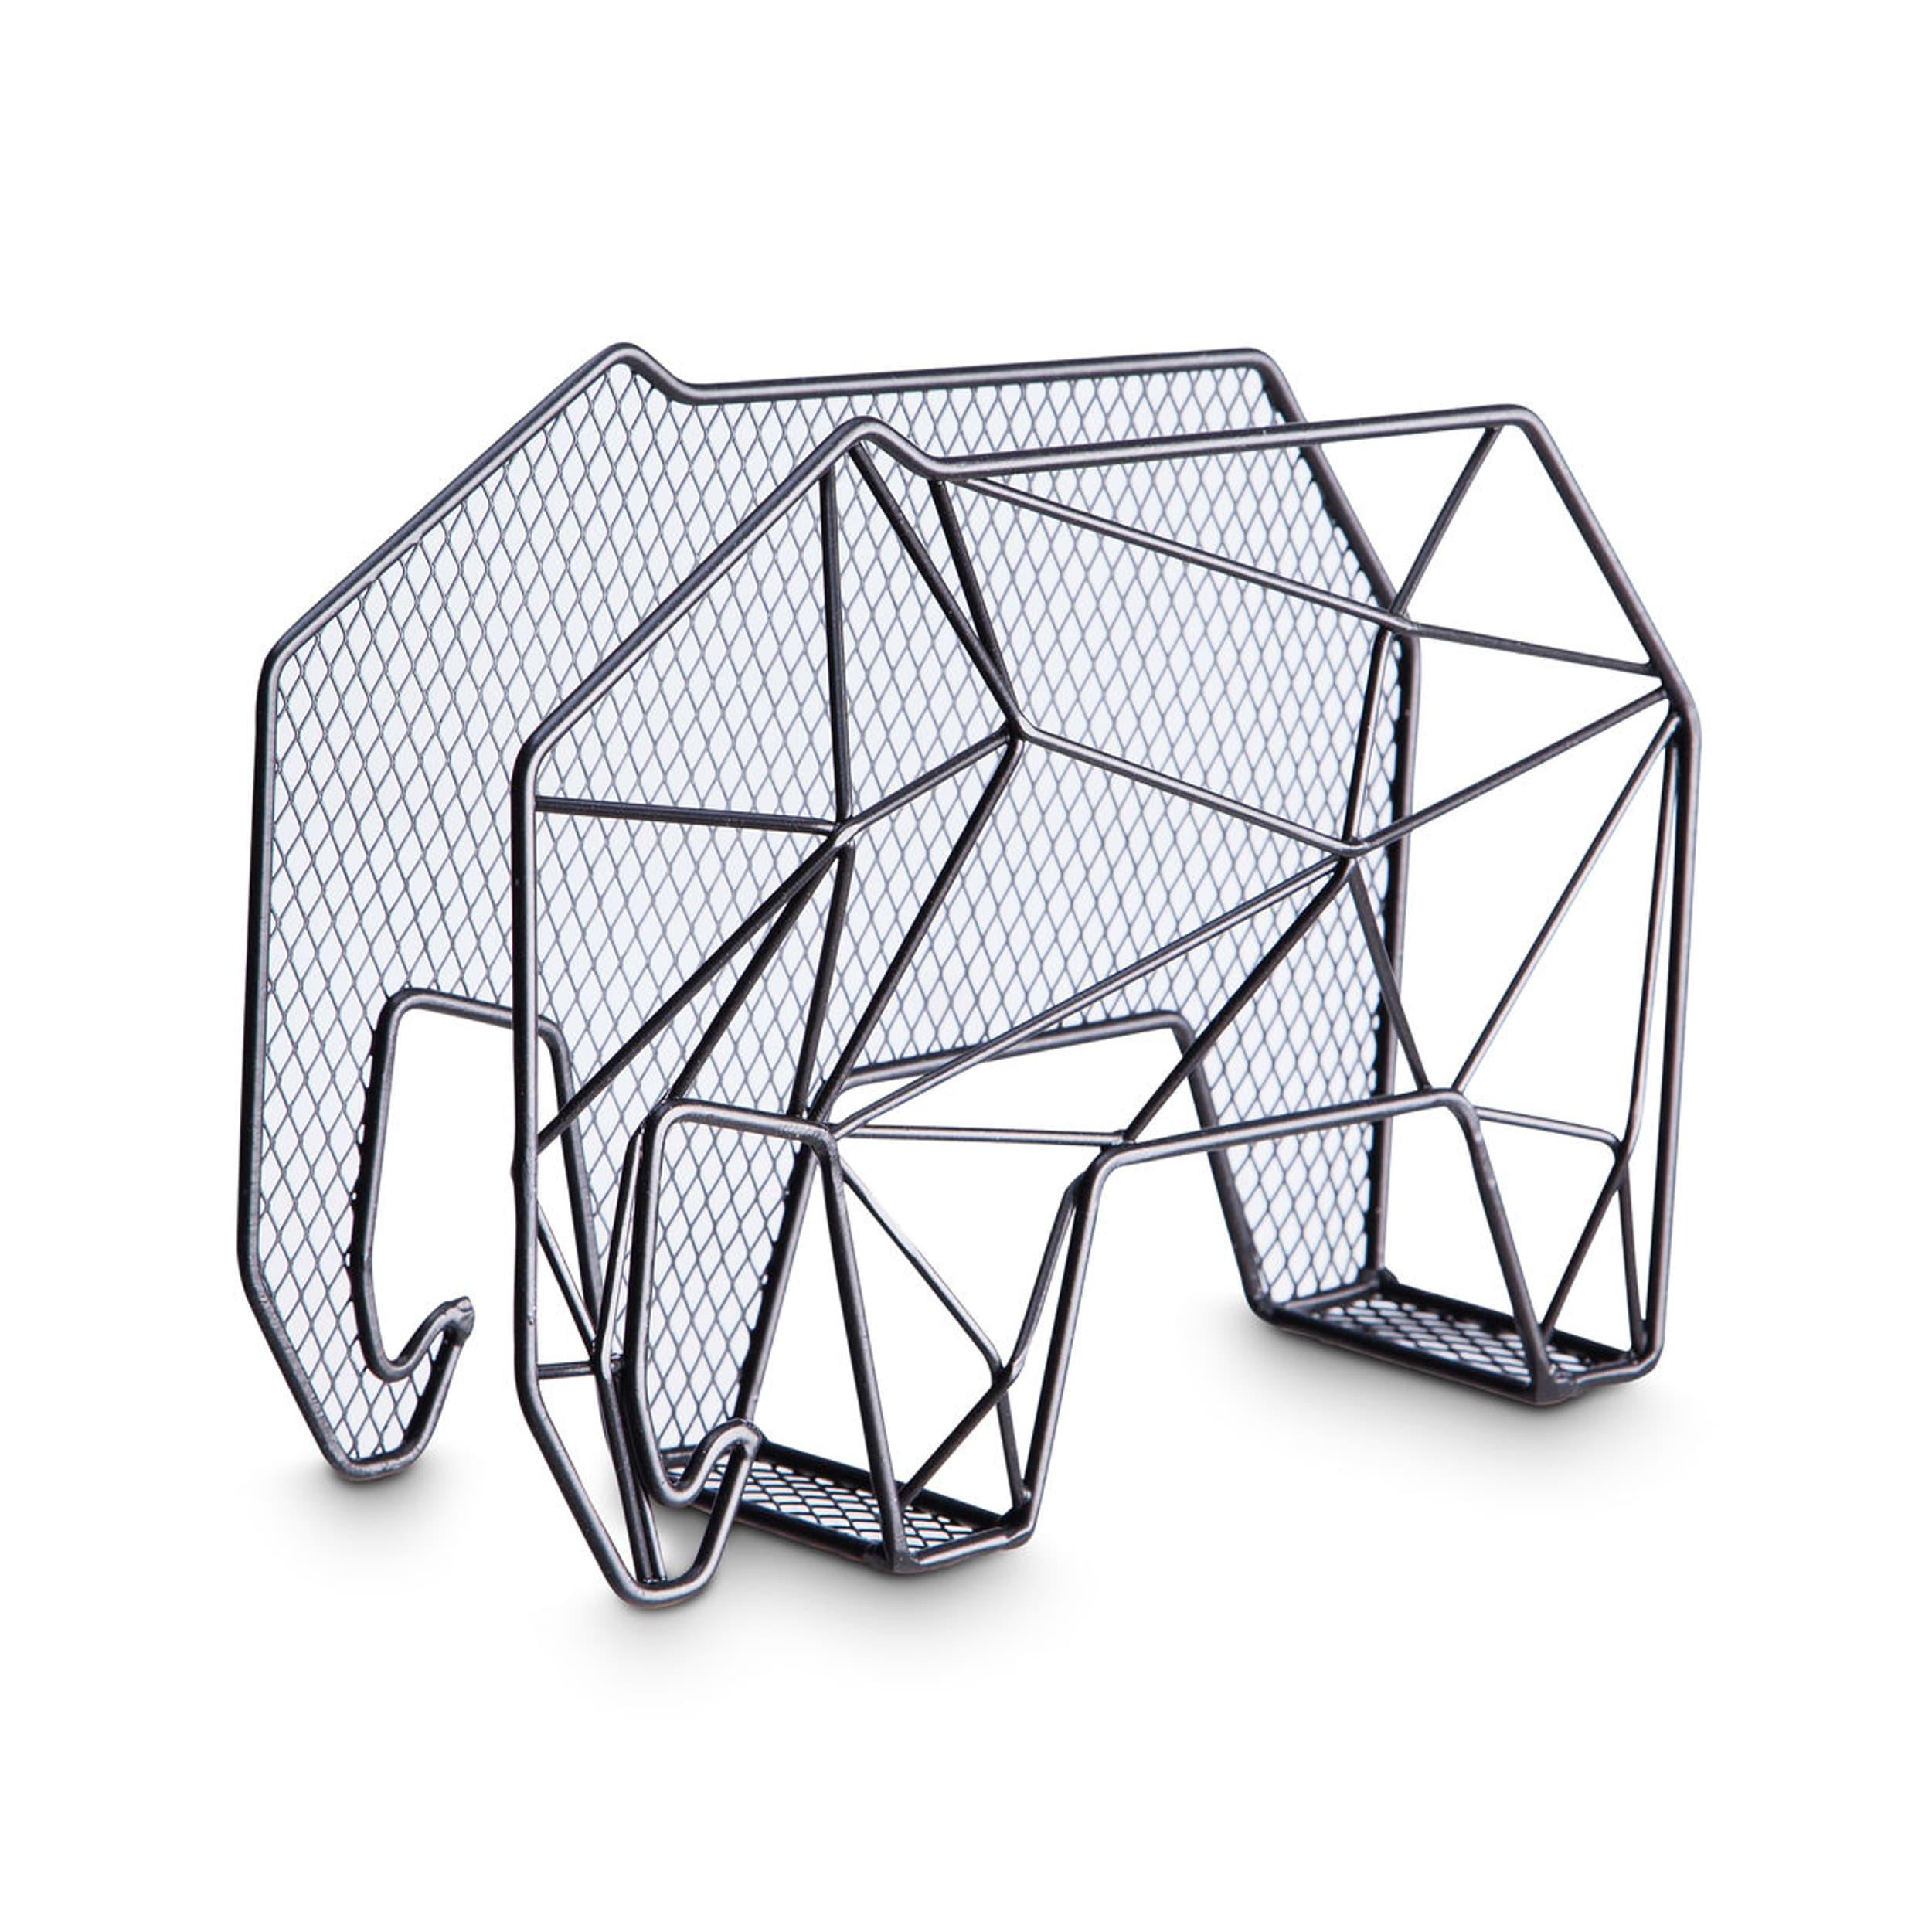 Image of Briefhalter ELEPHANT